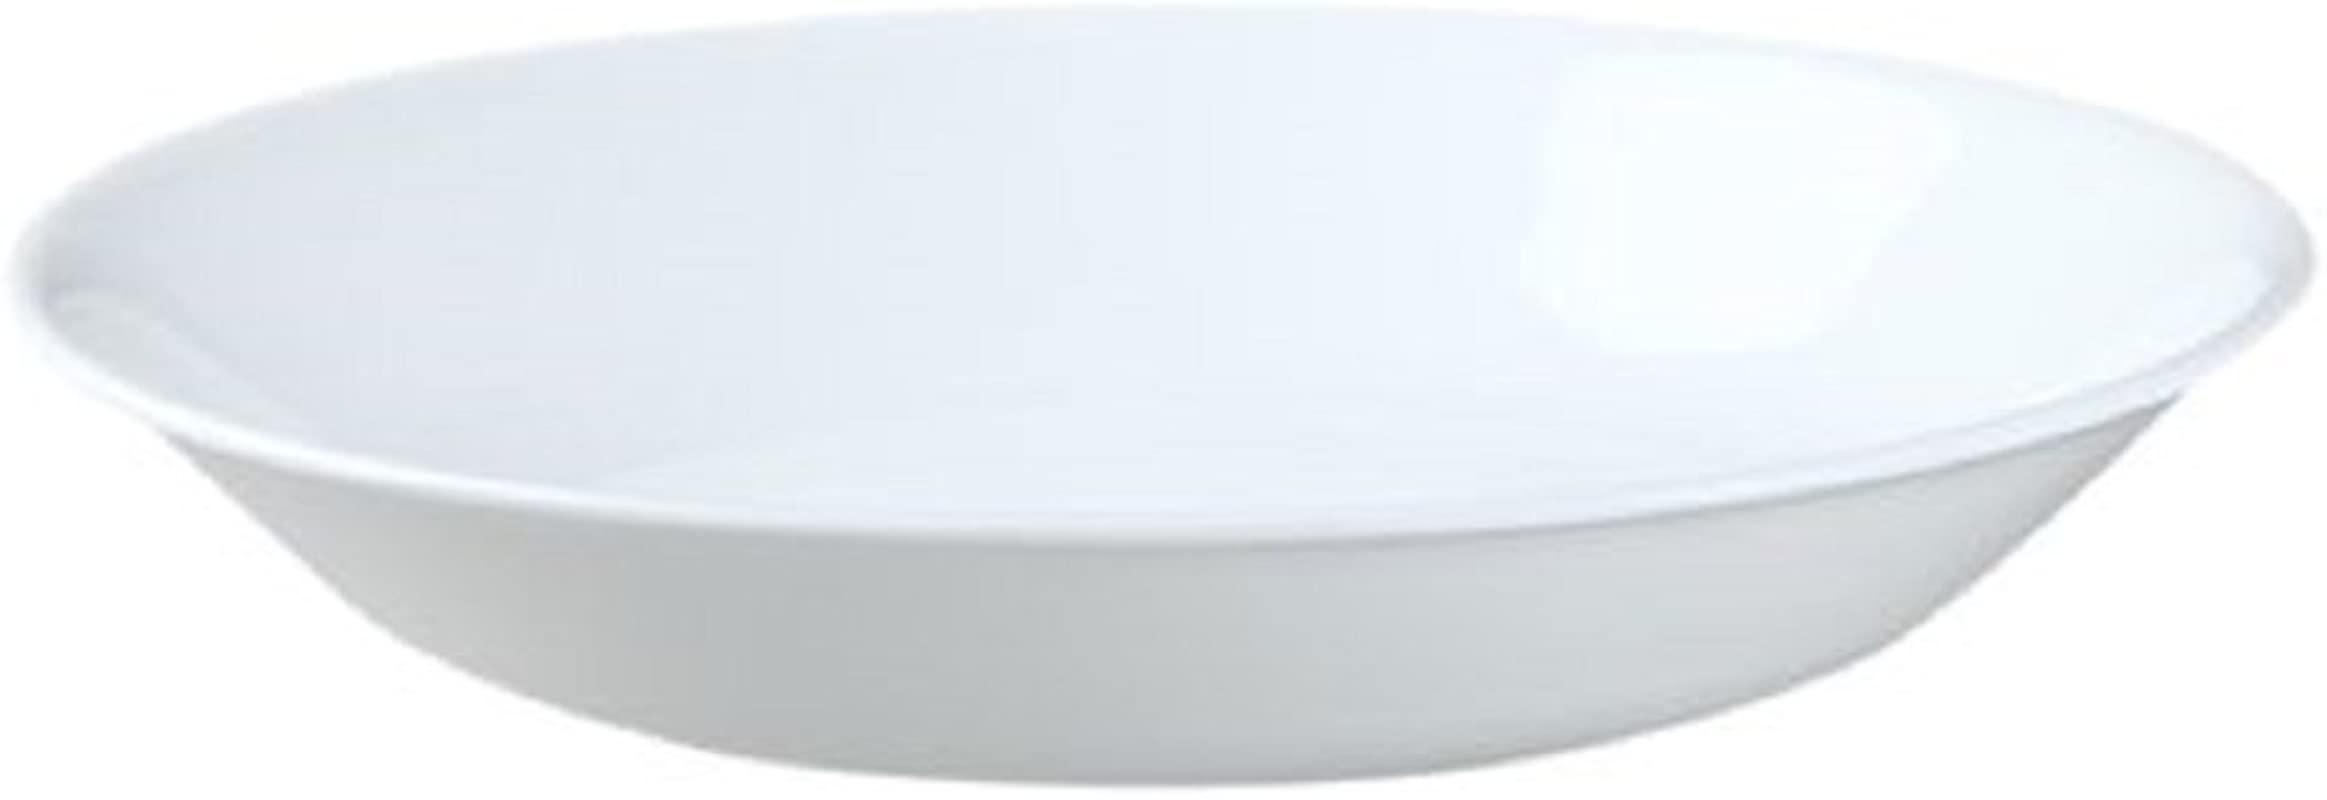 Corelle Livingware Winter Frost White 20 Ounce Pasta Bowl Set Of 8